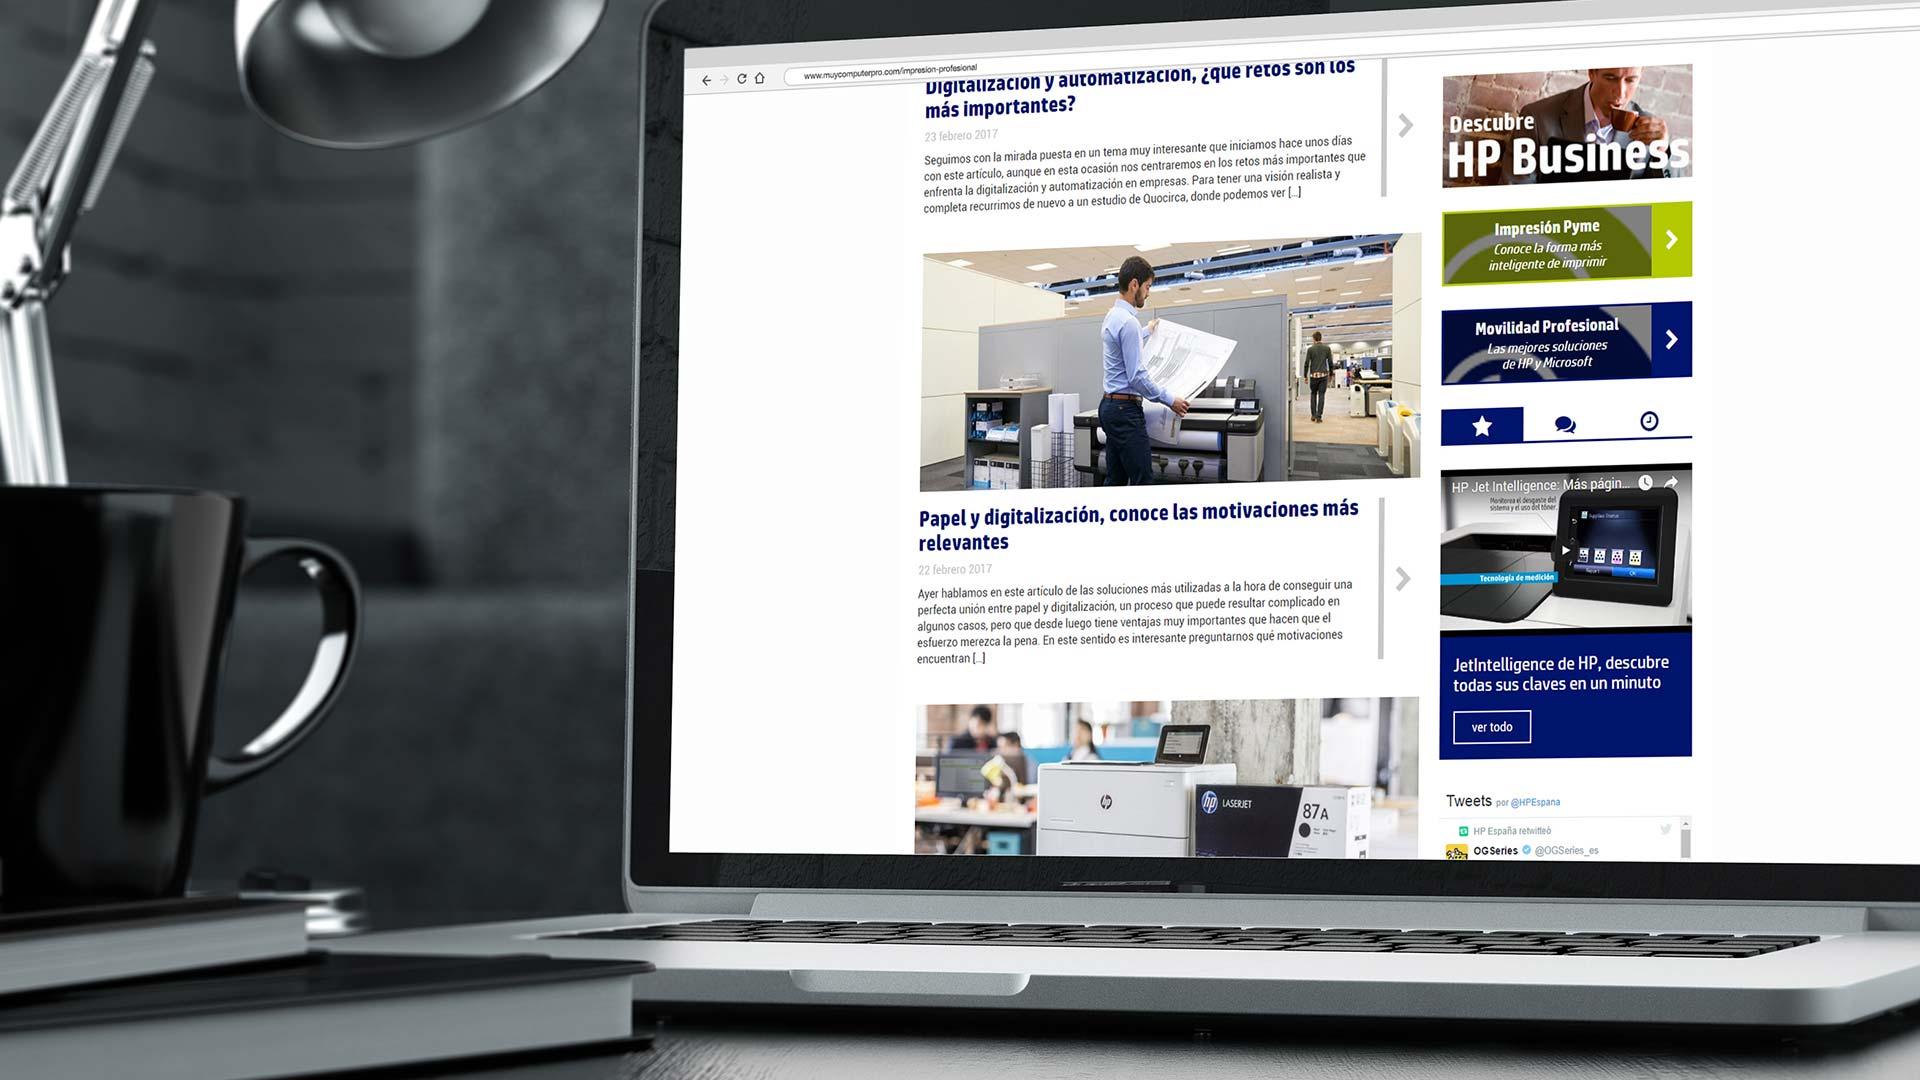 zona-patrocinada-content-marketing-hp-impresion_profesional_02